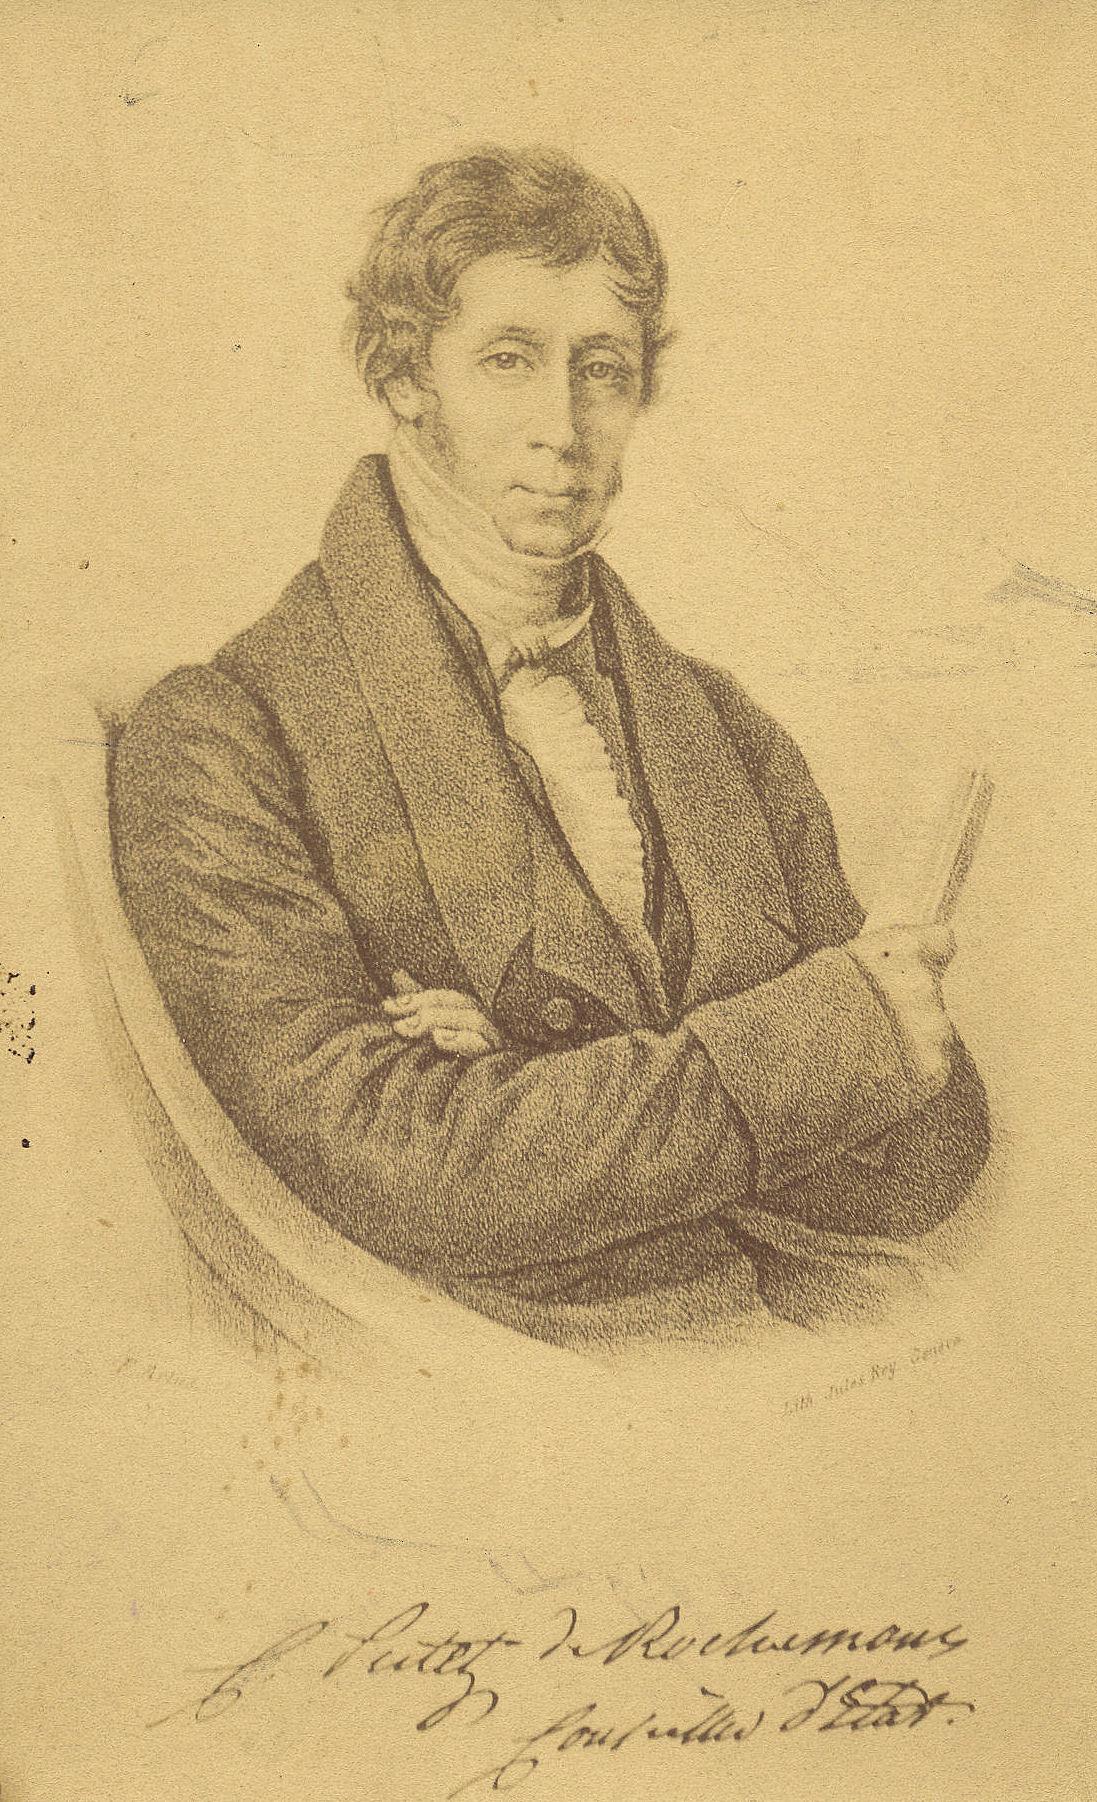 Charles Pictet de Rochemont